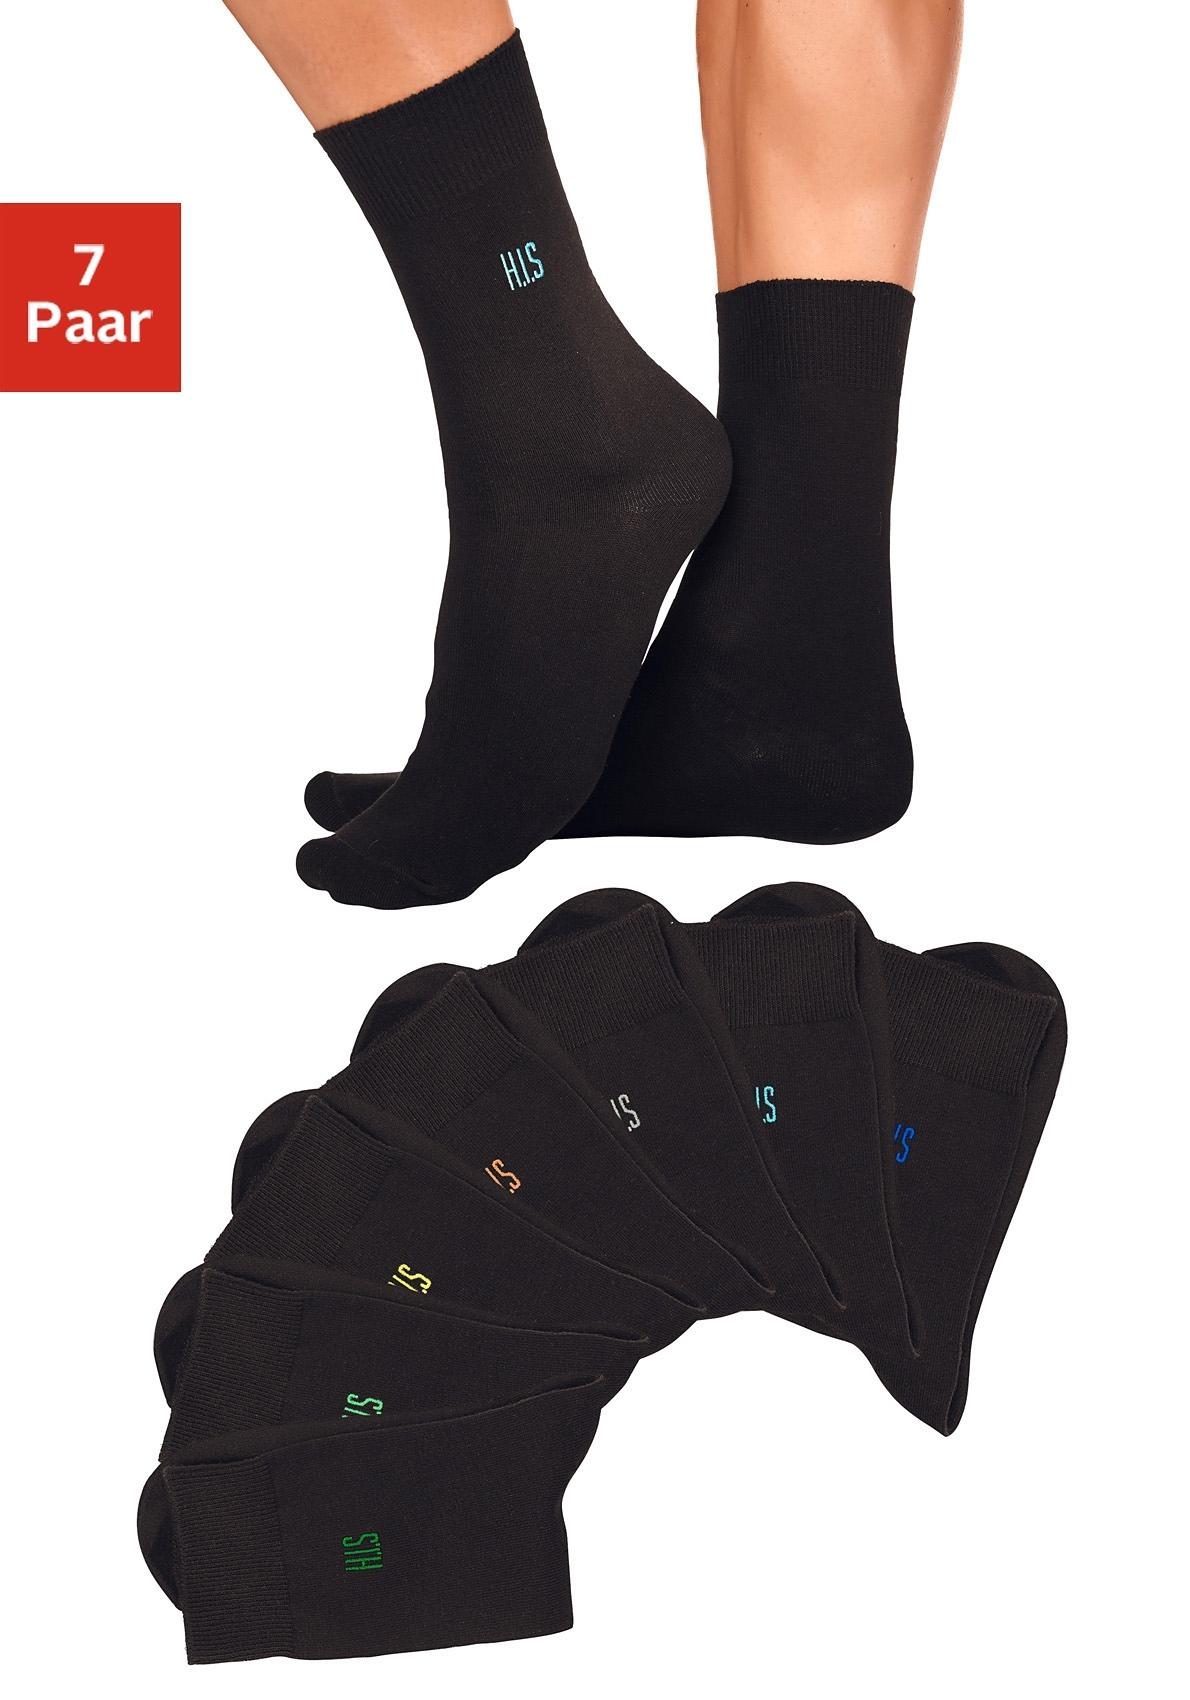 H.I.S basic sokken (7 paar) - gratis ruilen op lascana.nl